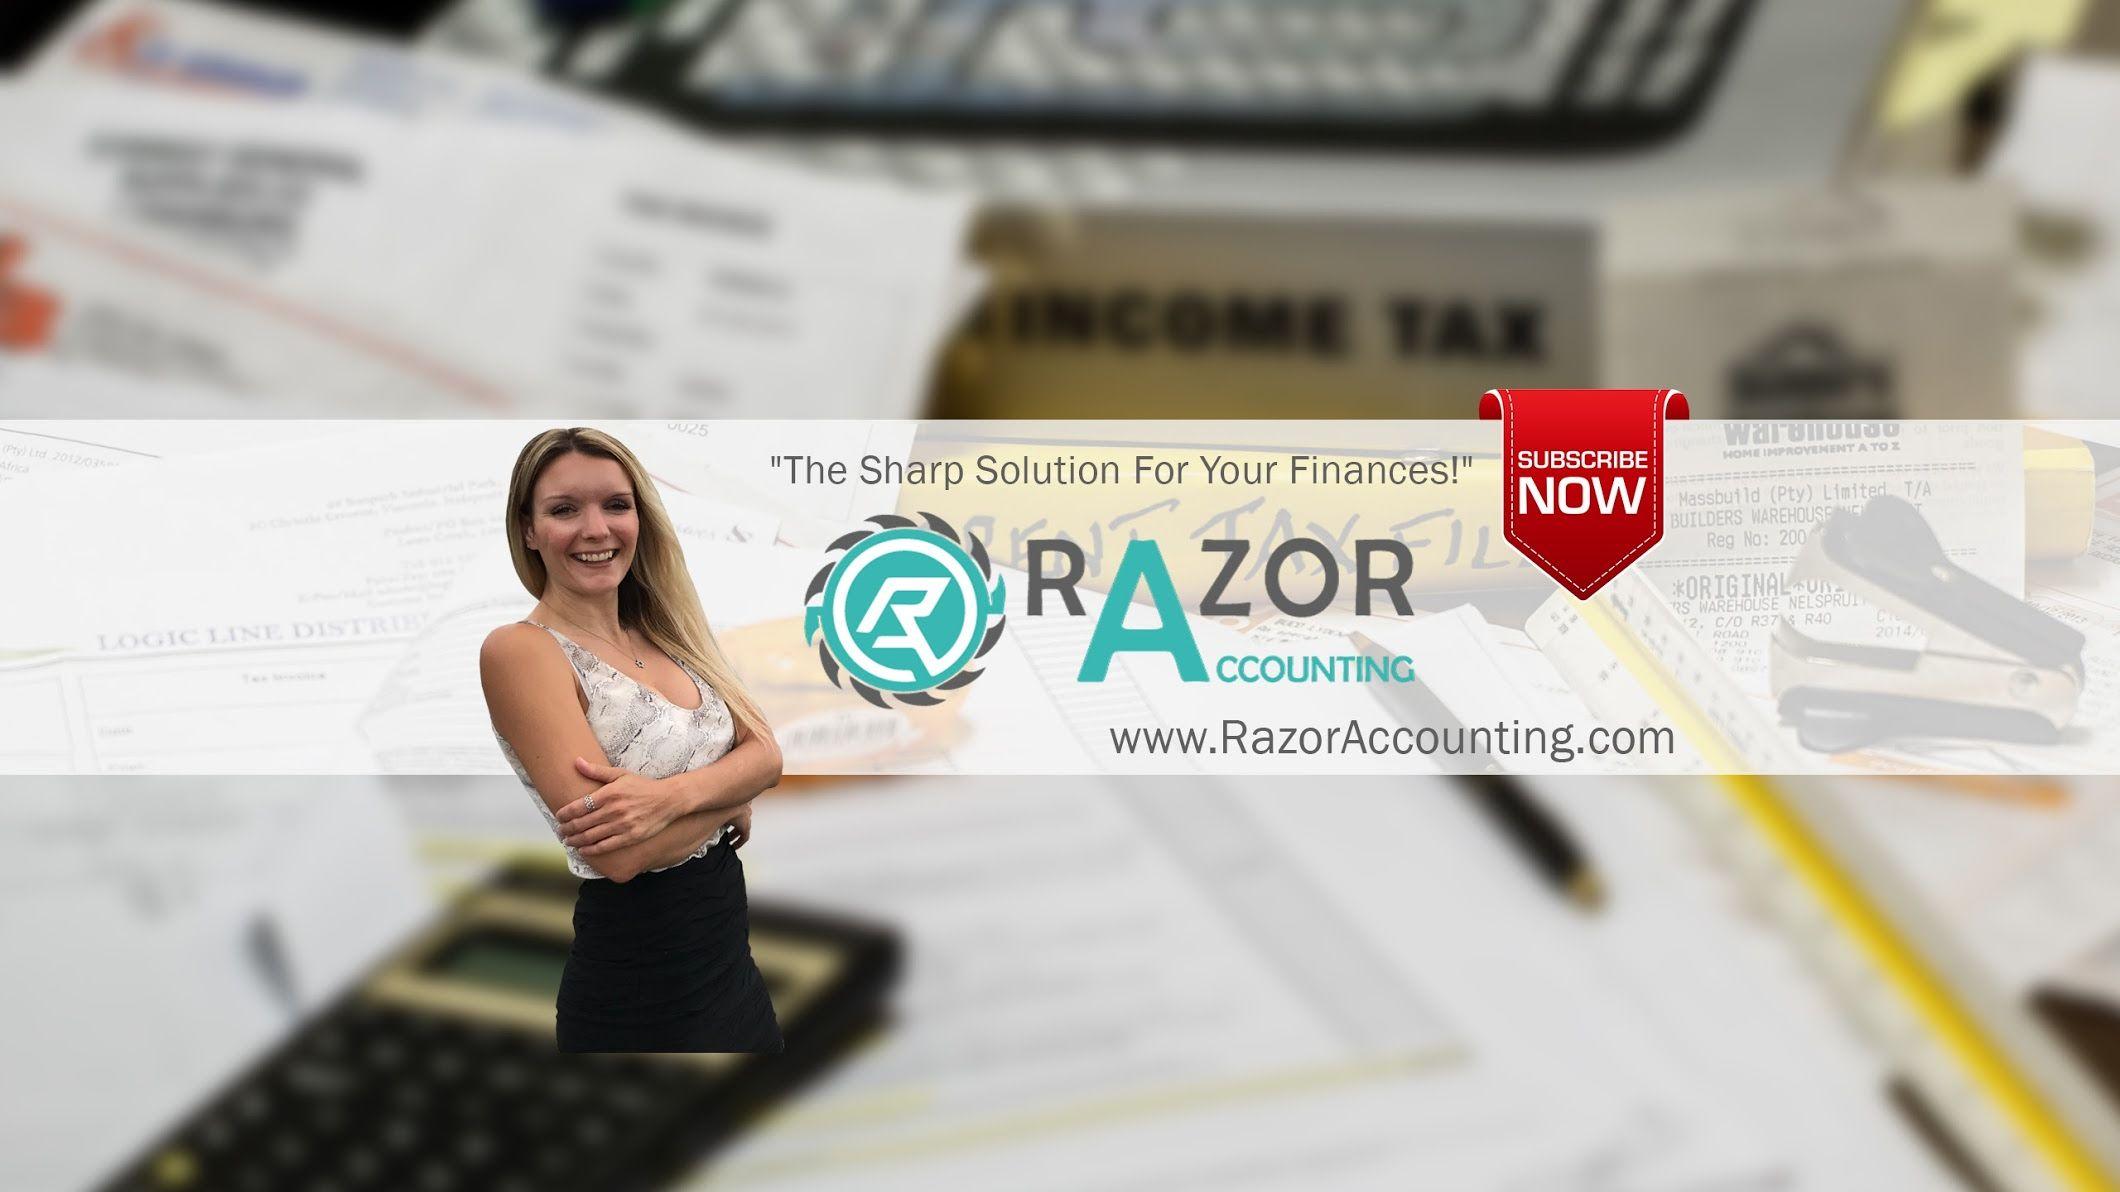 (321) Razor Accounting YouTube Accounting, Finance